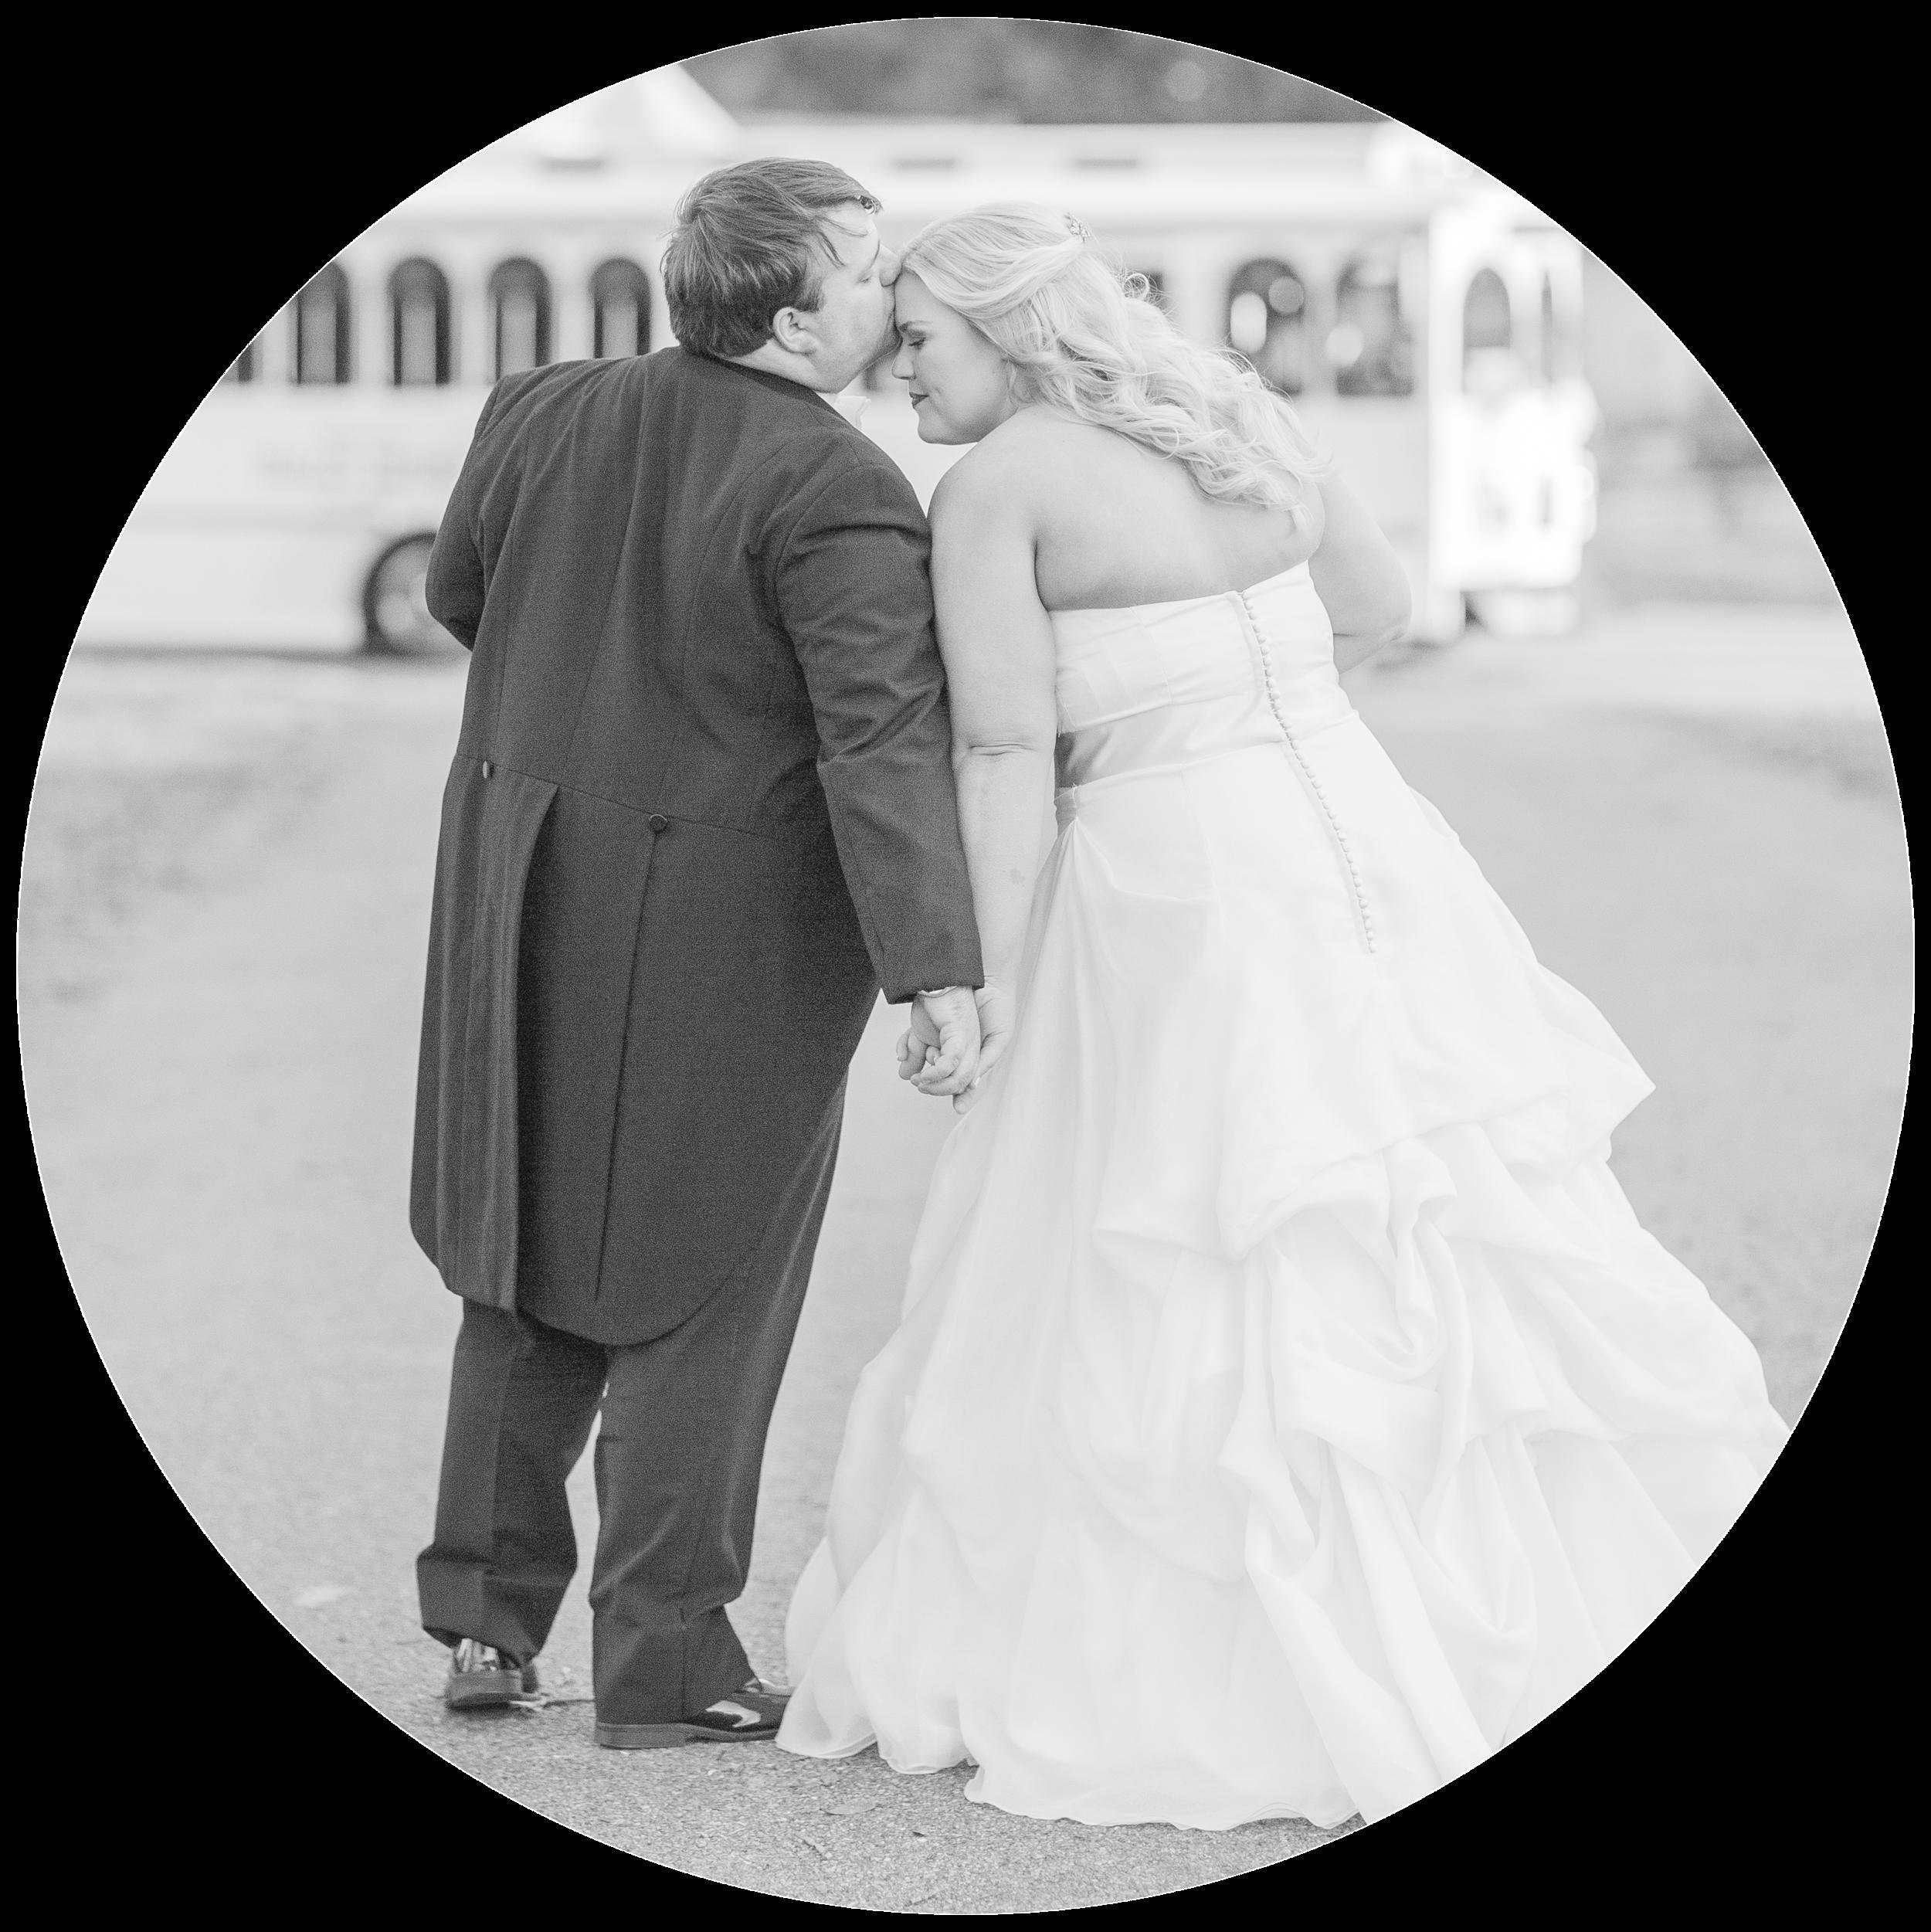 mississippi-wedding-photographer-4.png